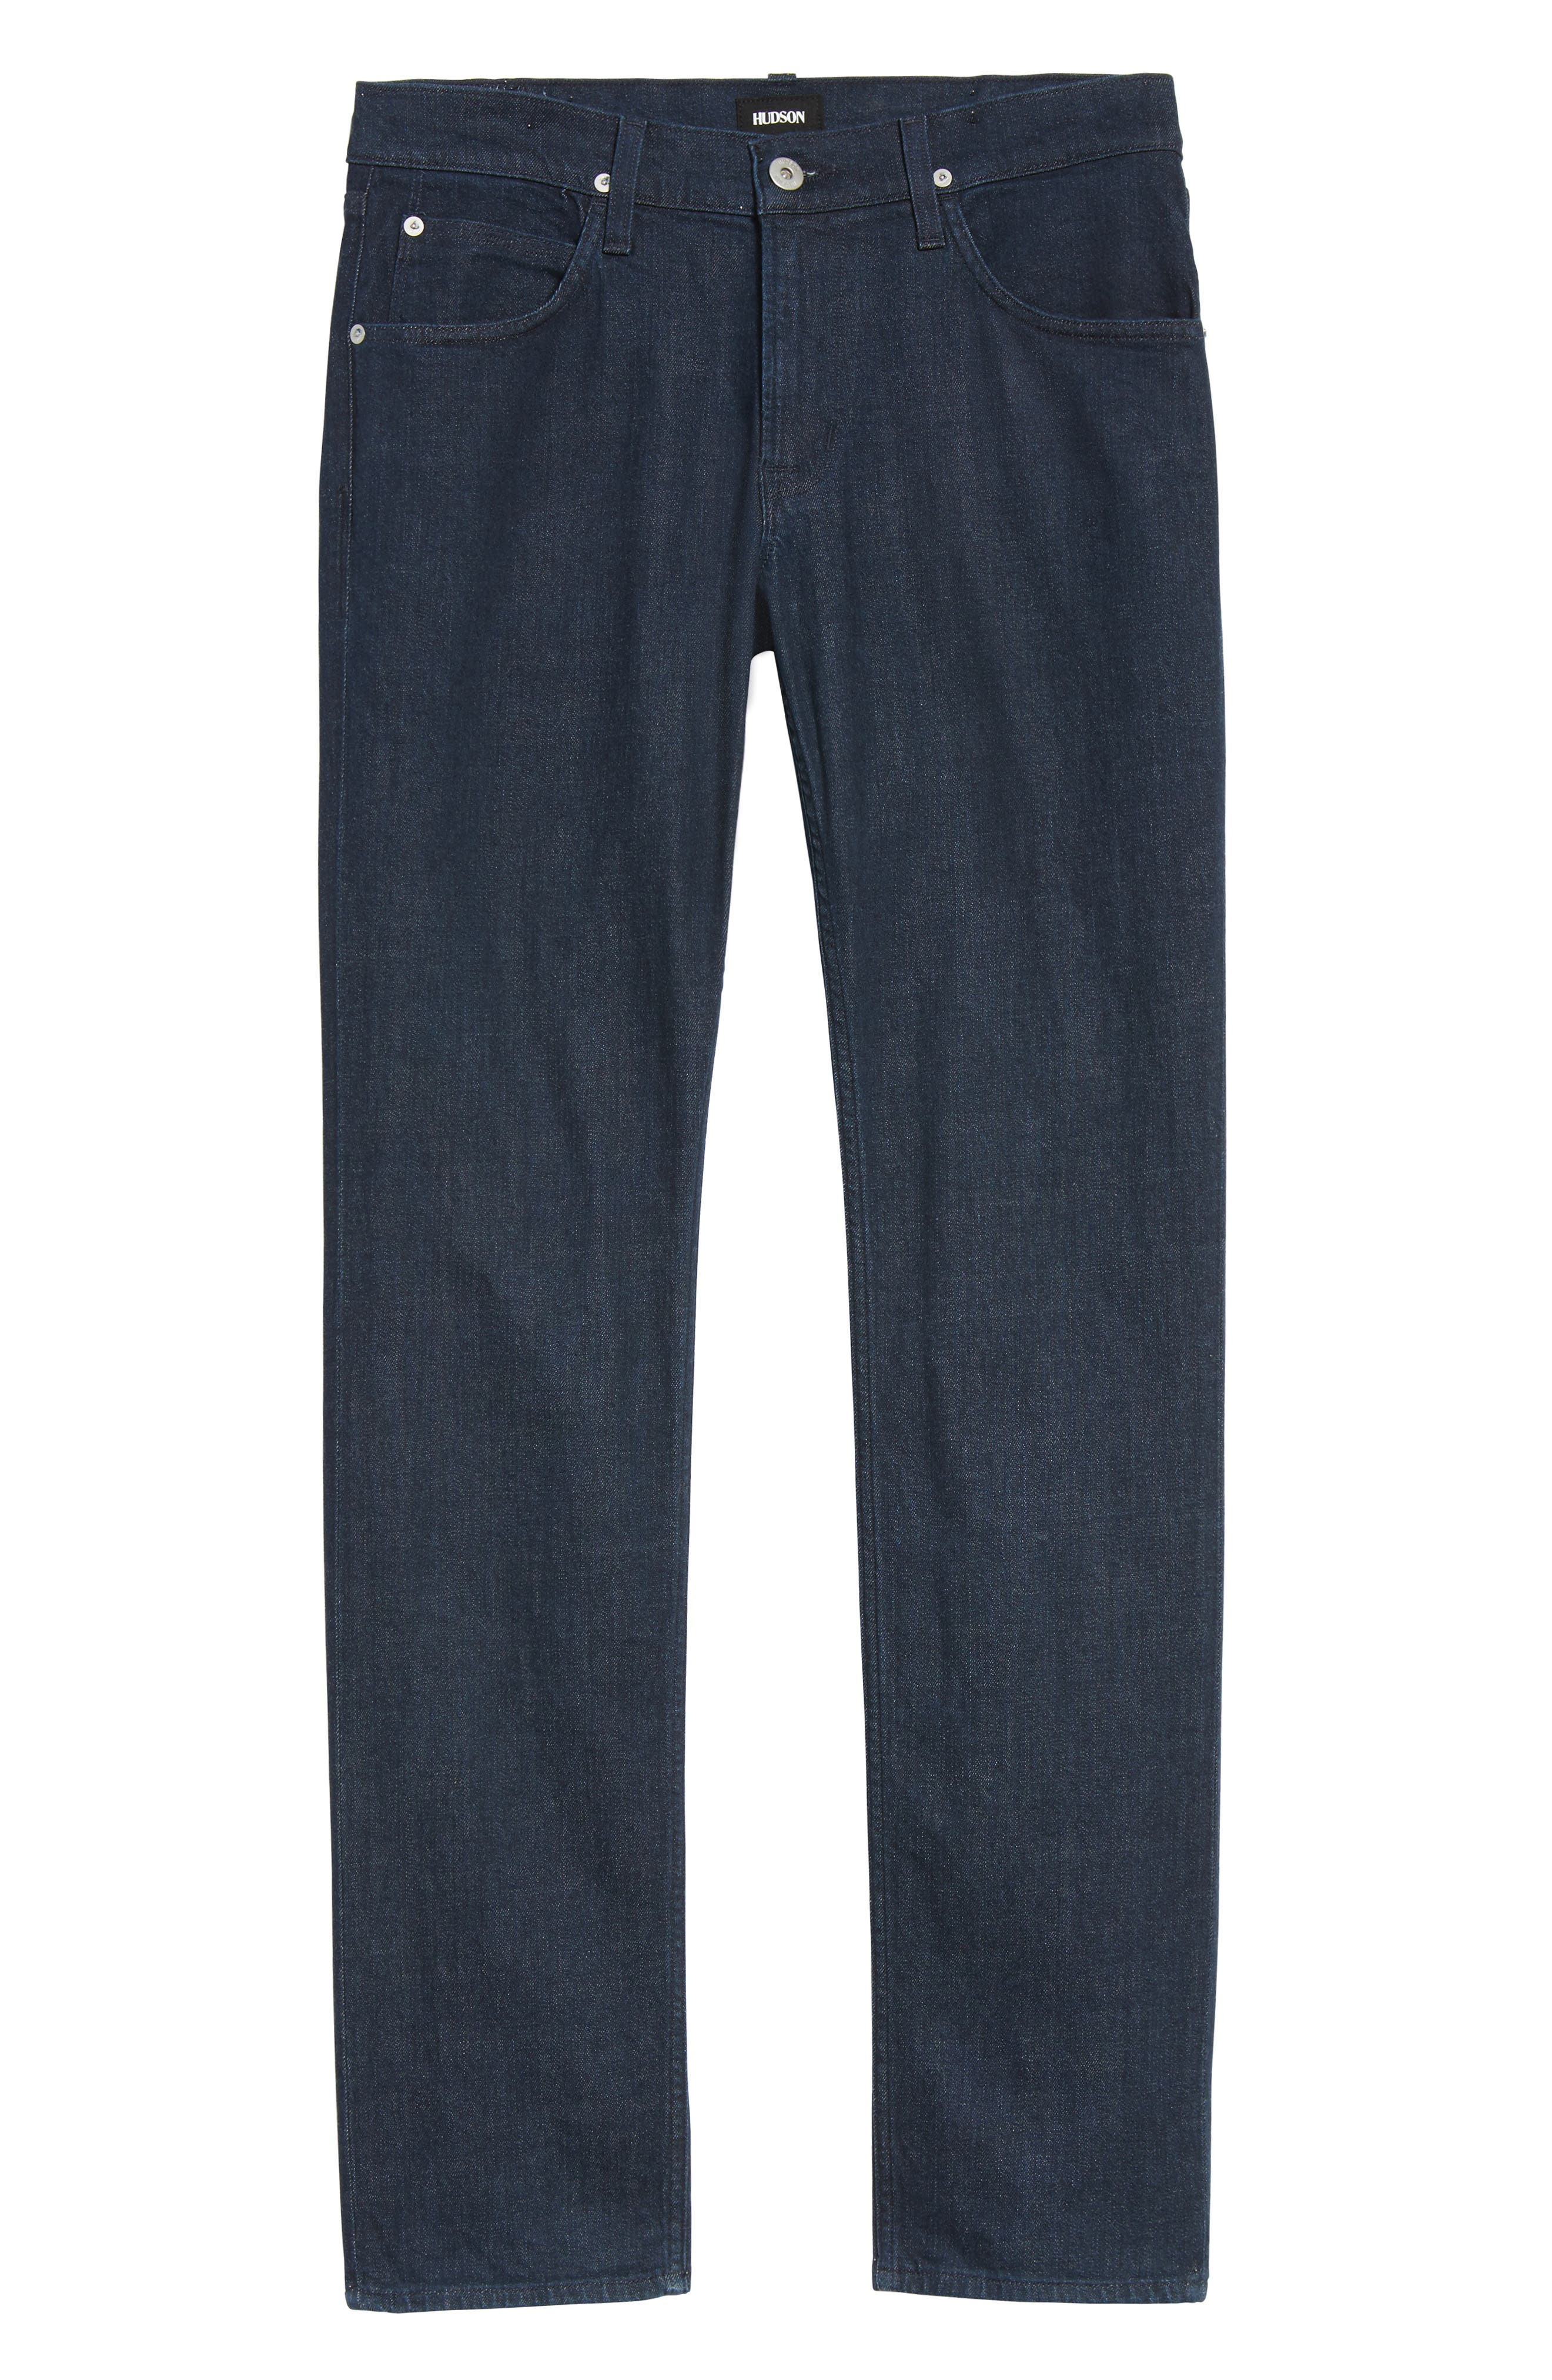 Blake Slim Fit Jeans,                             Alternate thumbnail 6, color,                             Firebrand